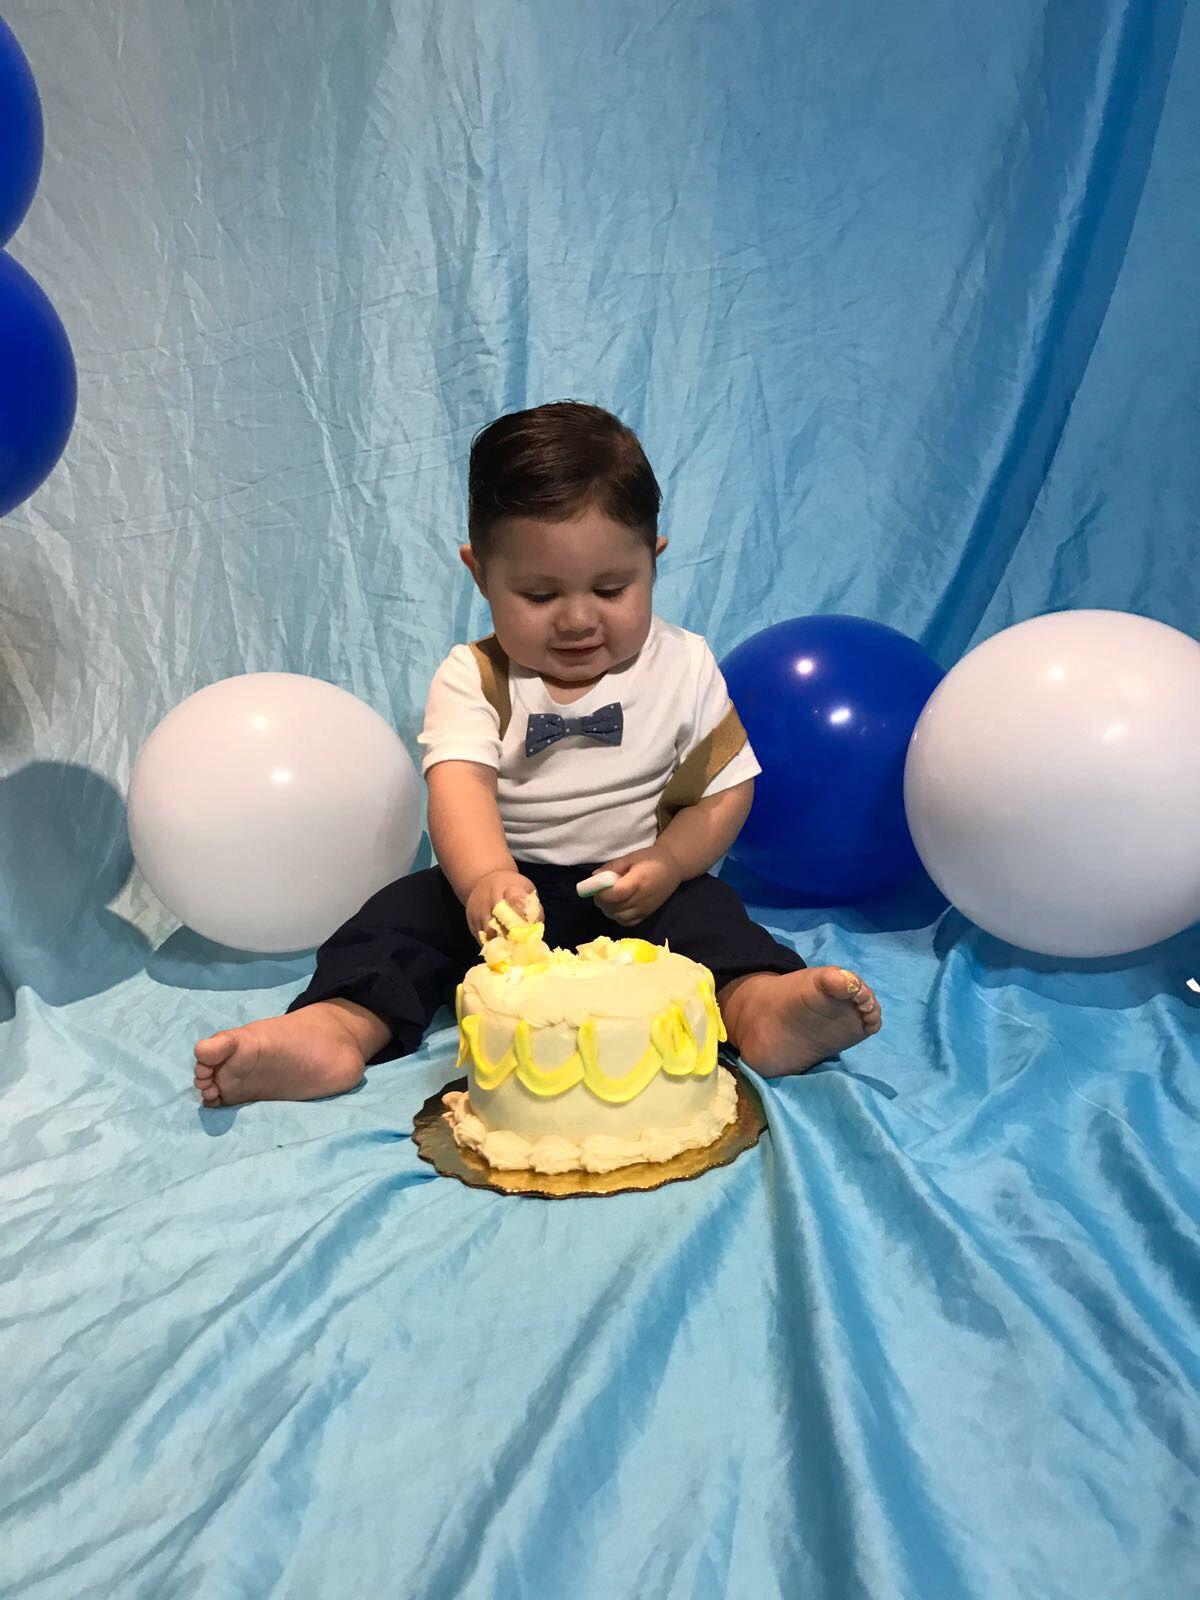 22+ Baby boy cake smash ideas ideas in 2021